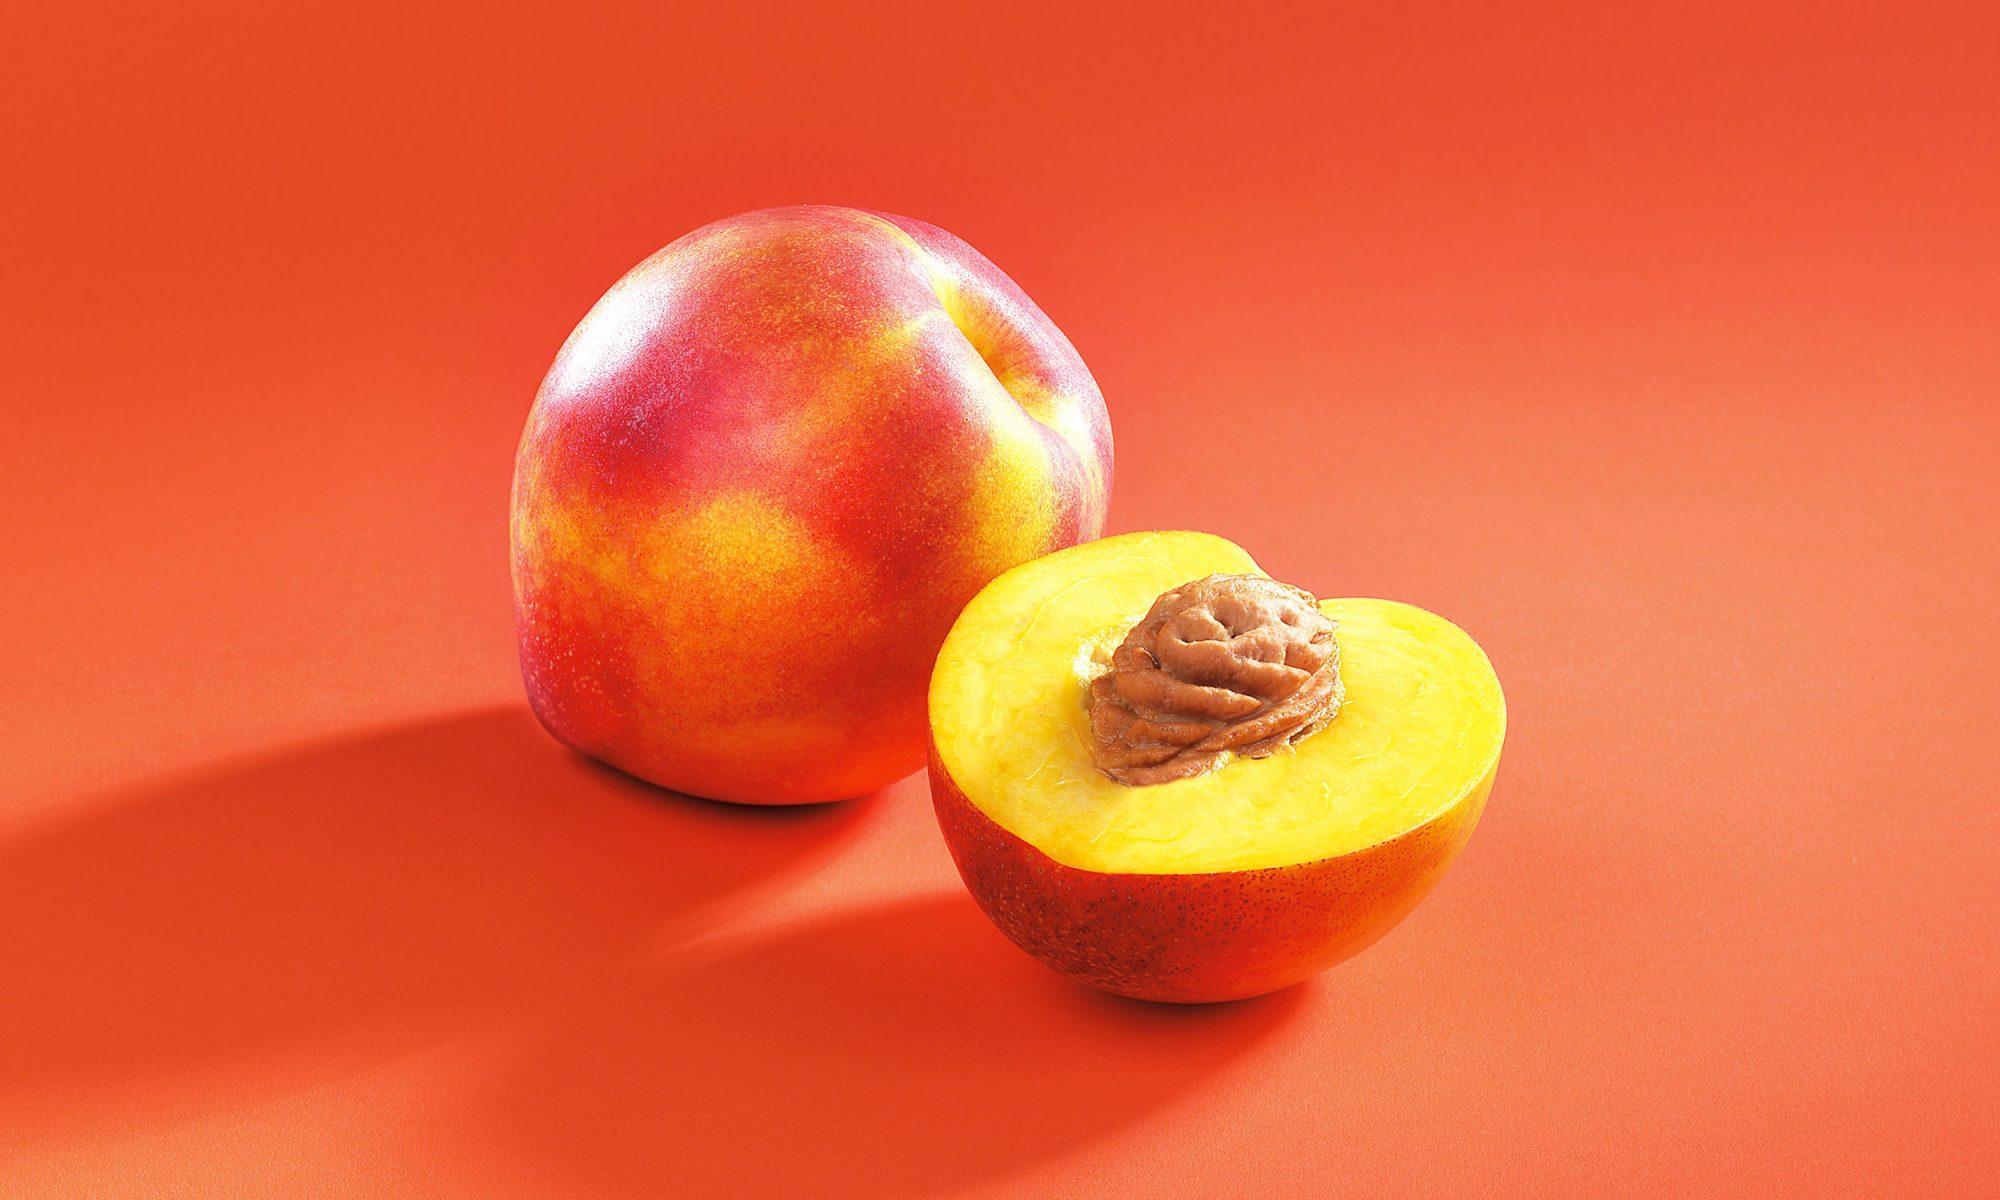 EC: Climate Change Devastated Georgia's Peach Crop